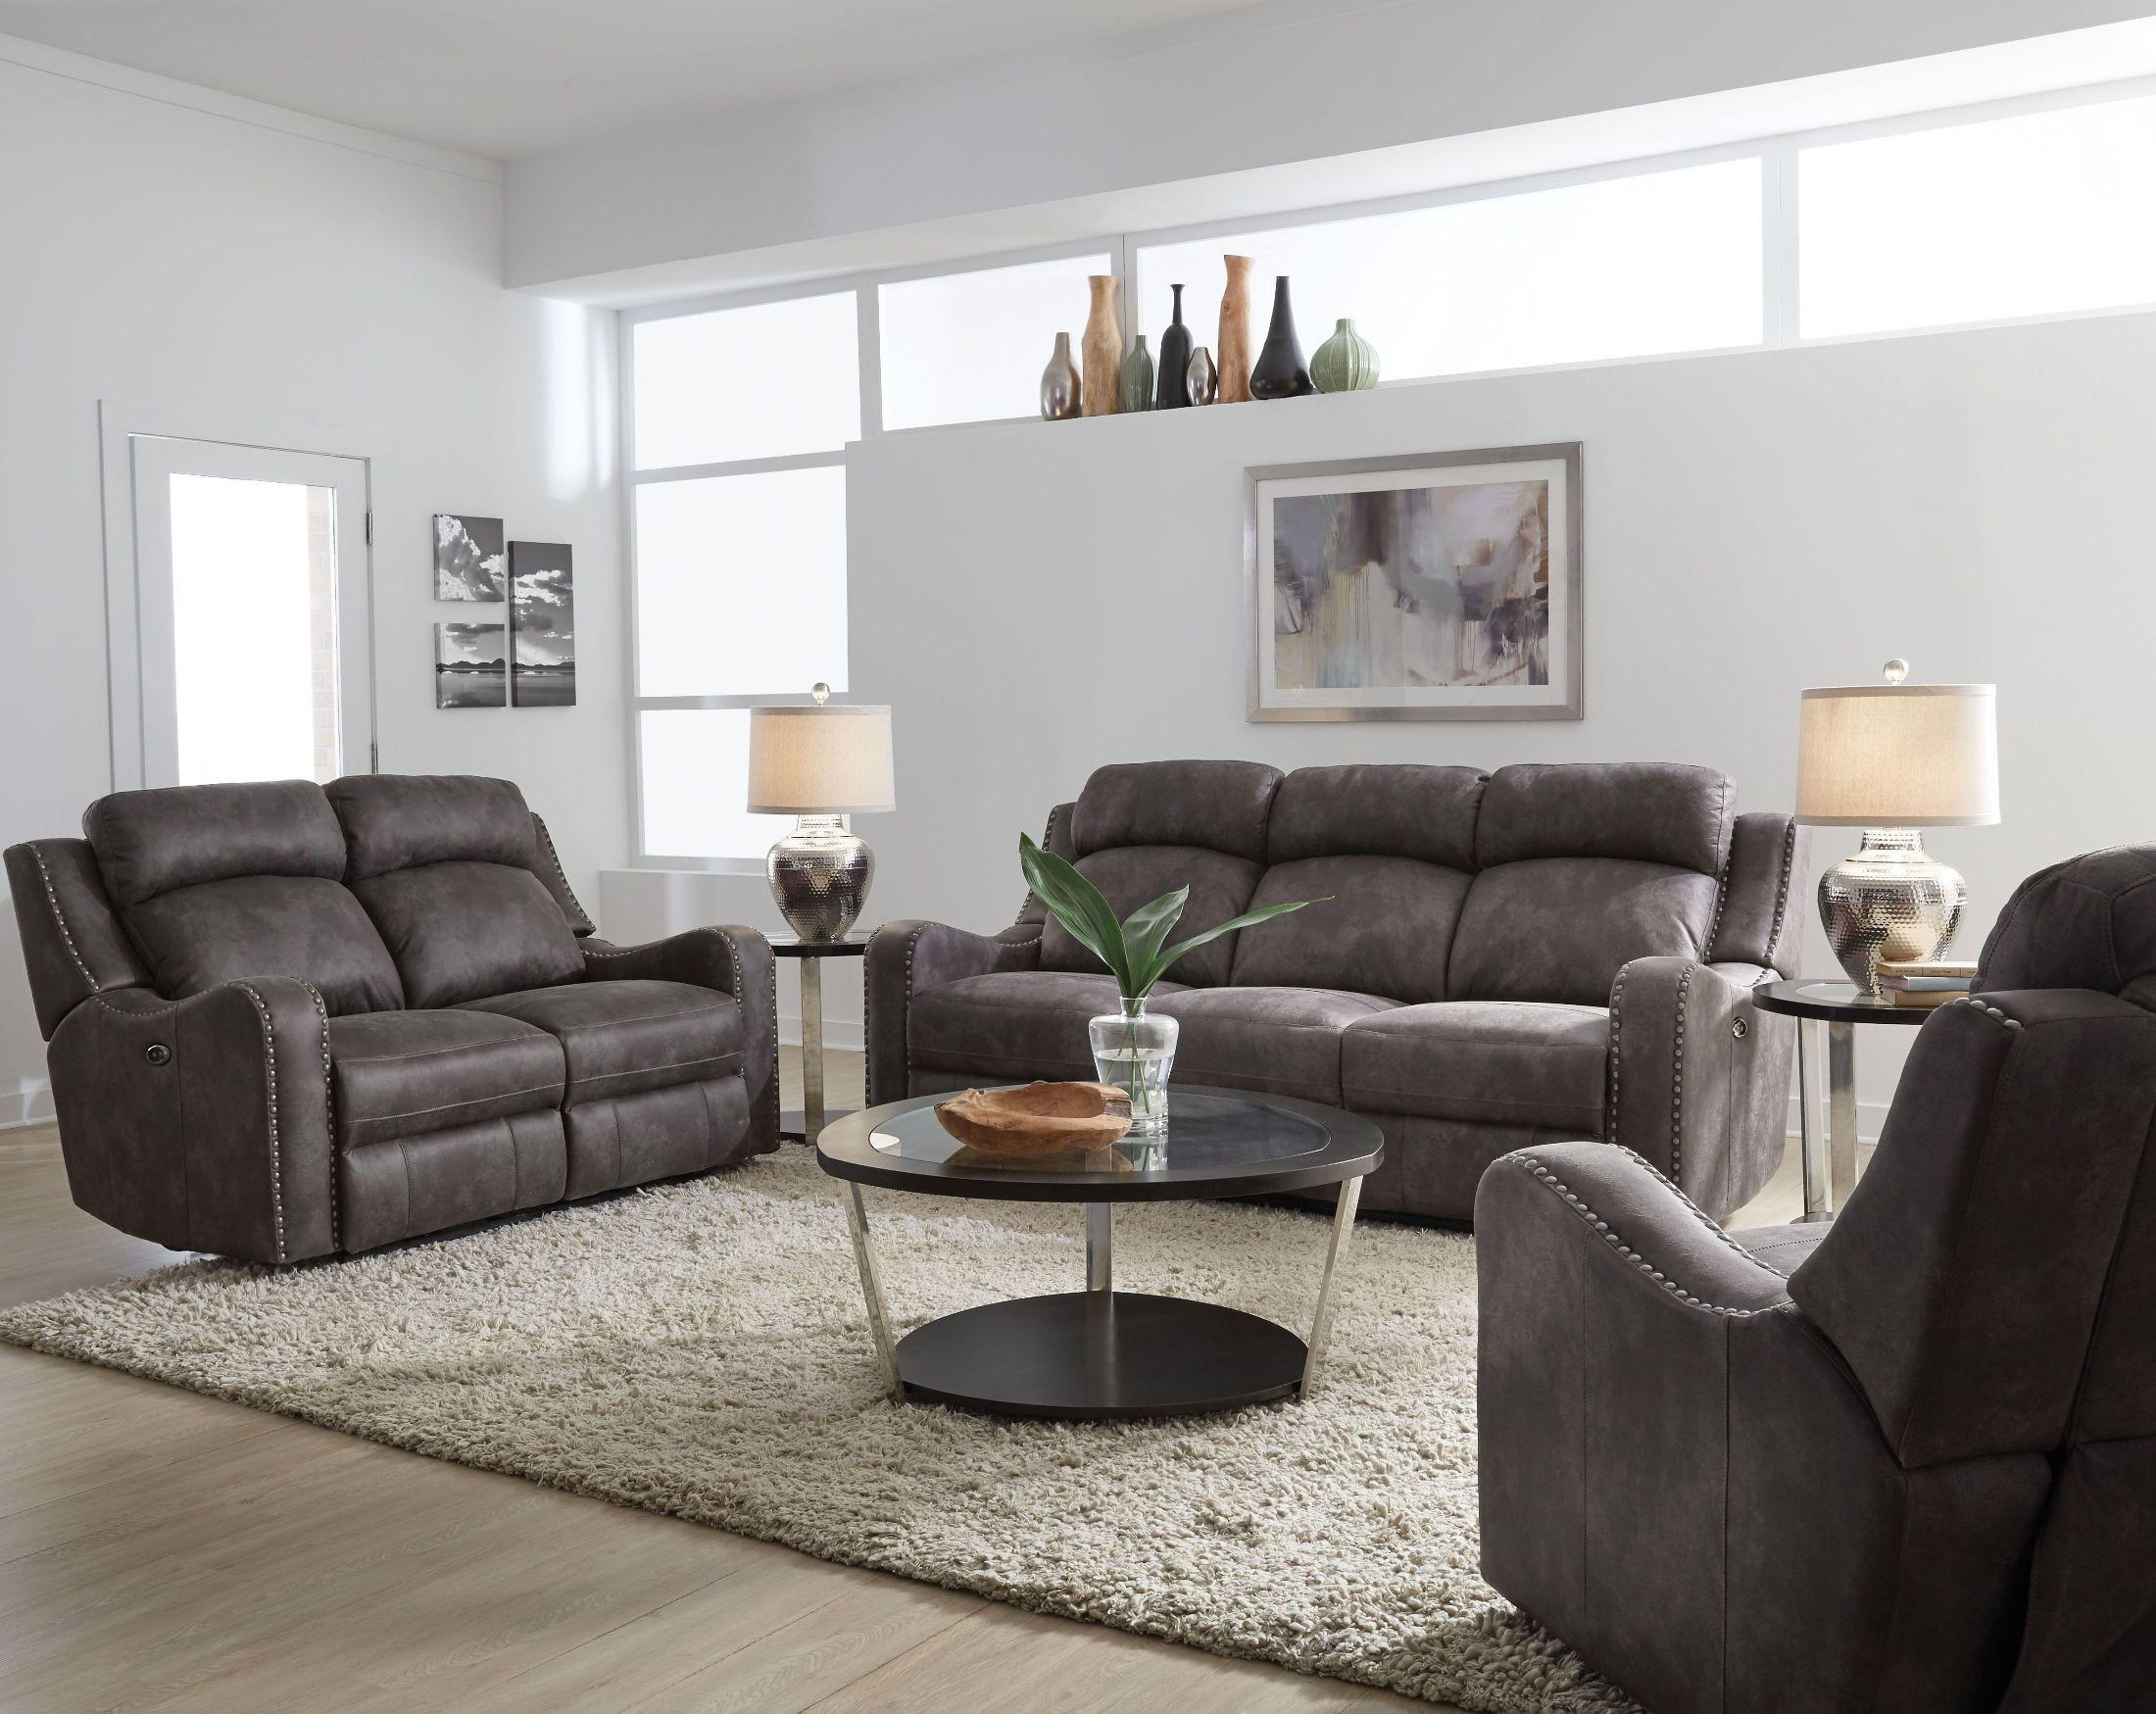 Standard Furniture Bankston Gray Power Reclining Living Room Set ...